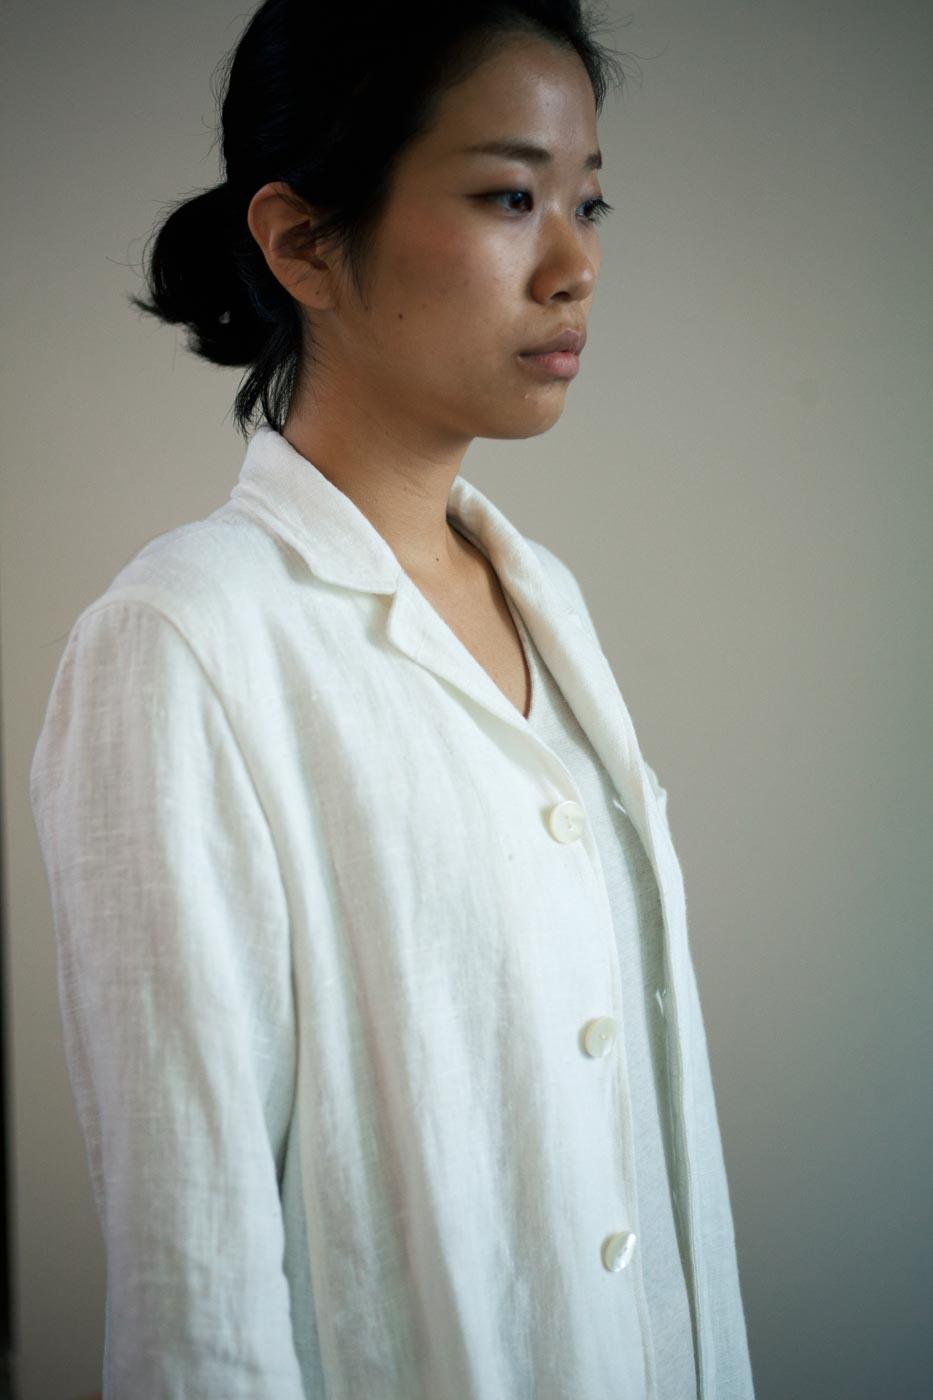 Jurgen Lehl Jacket Made of Lithuania Linen